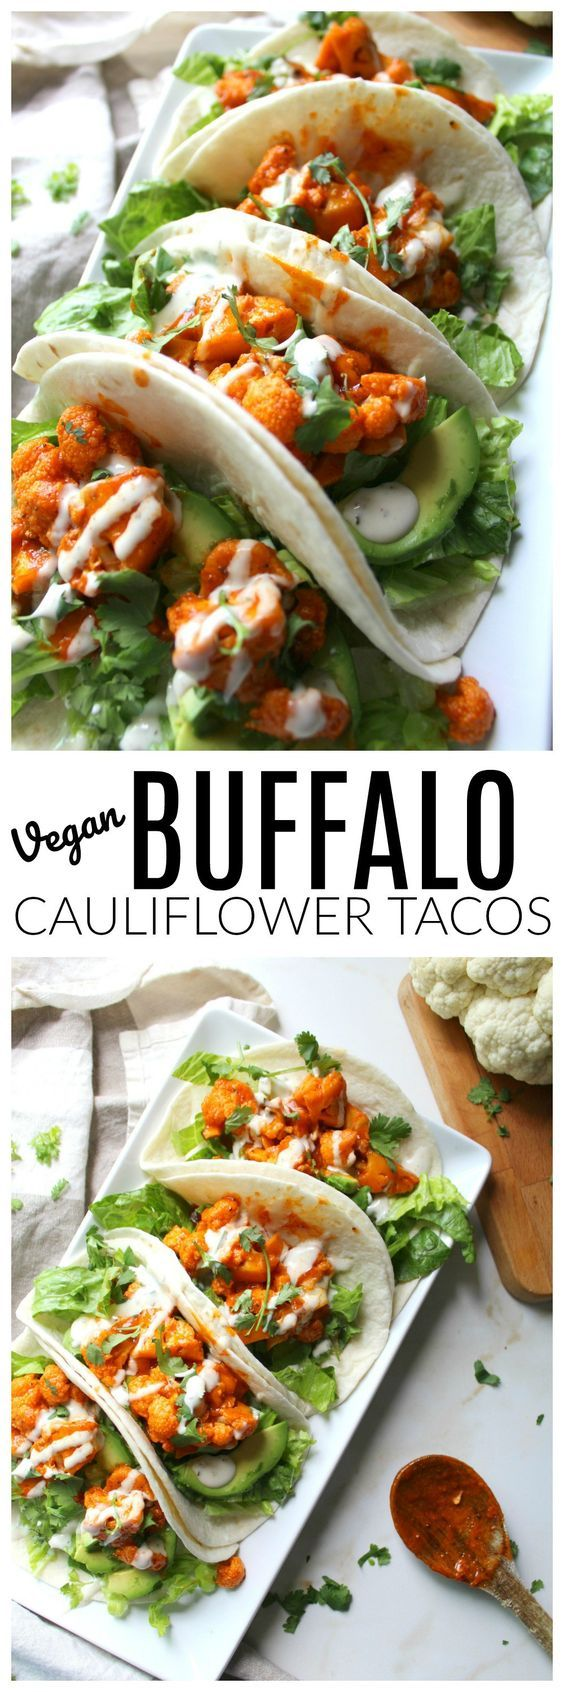 Vegan Buffalo Cauliflower Tacos